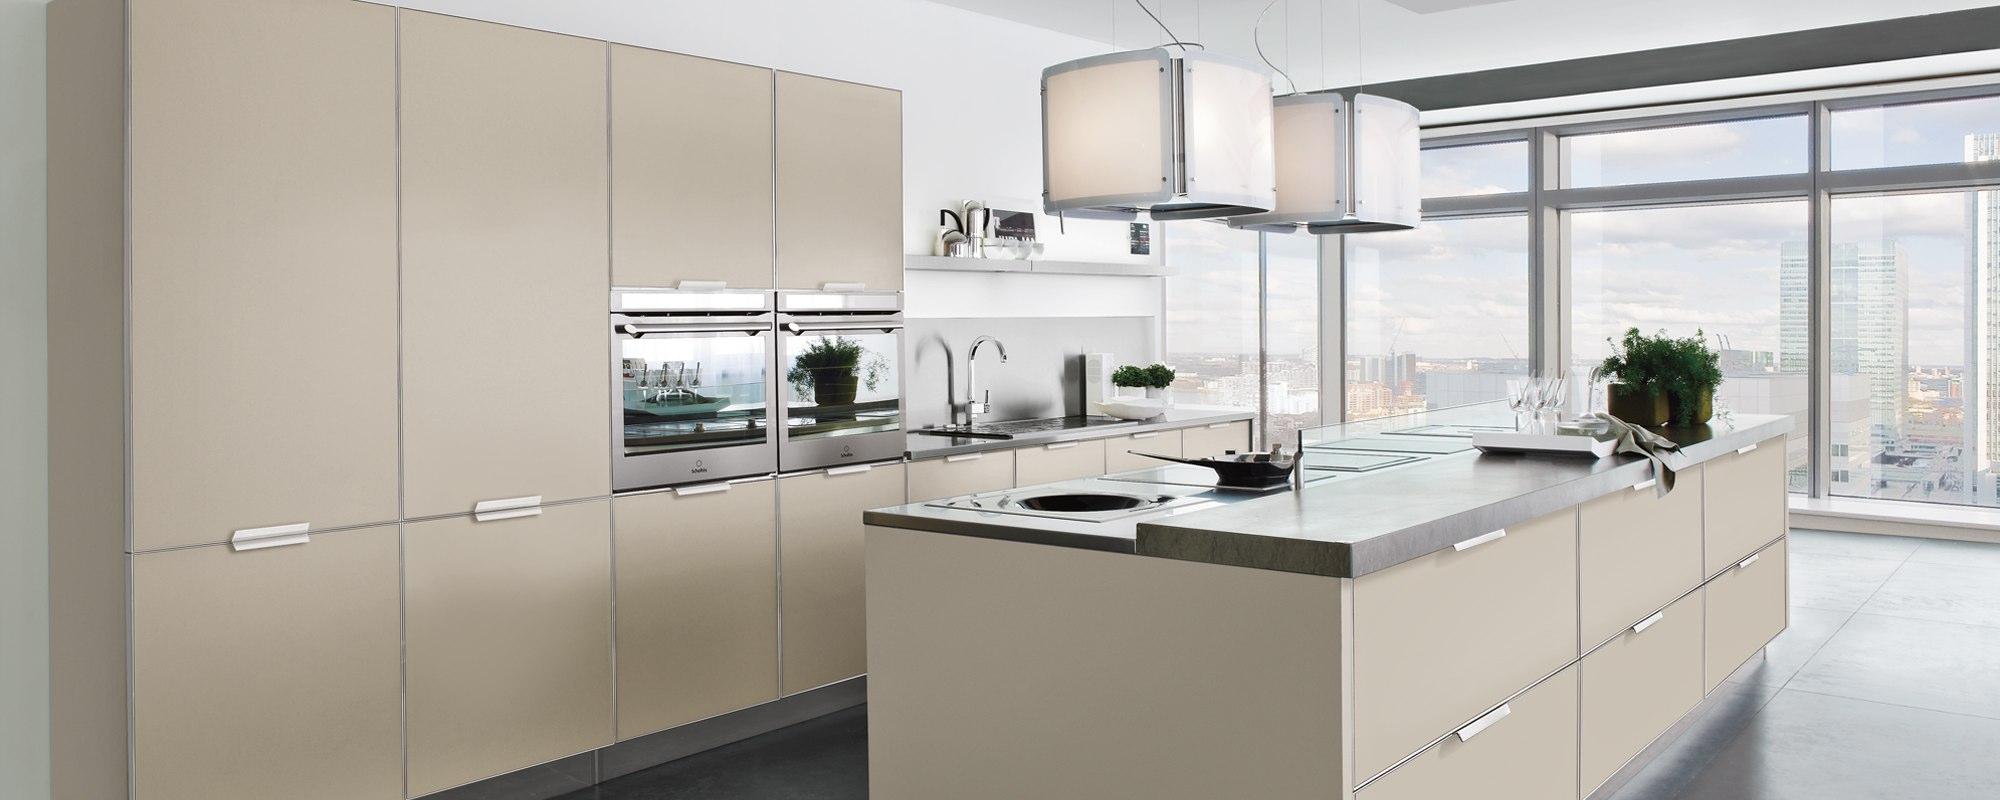 Stunning stosa cucine moderne photos ideas design 2017 for Cucine 2017 moderne